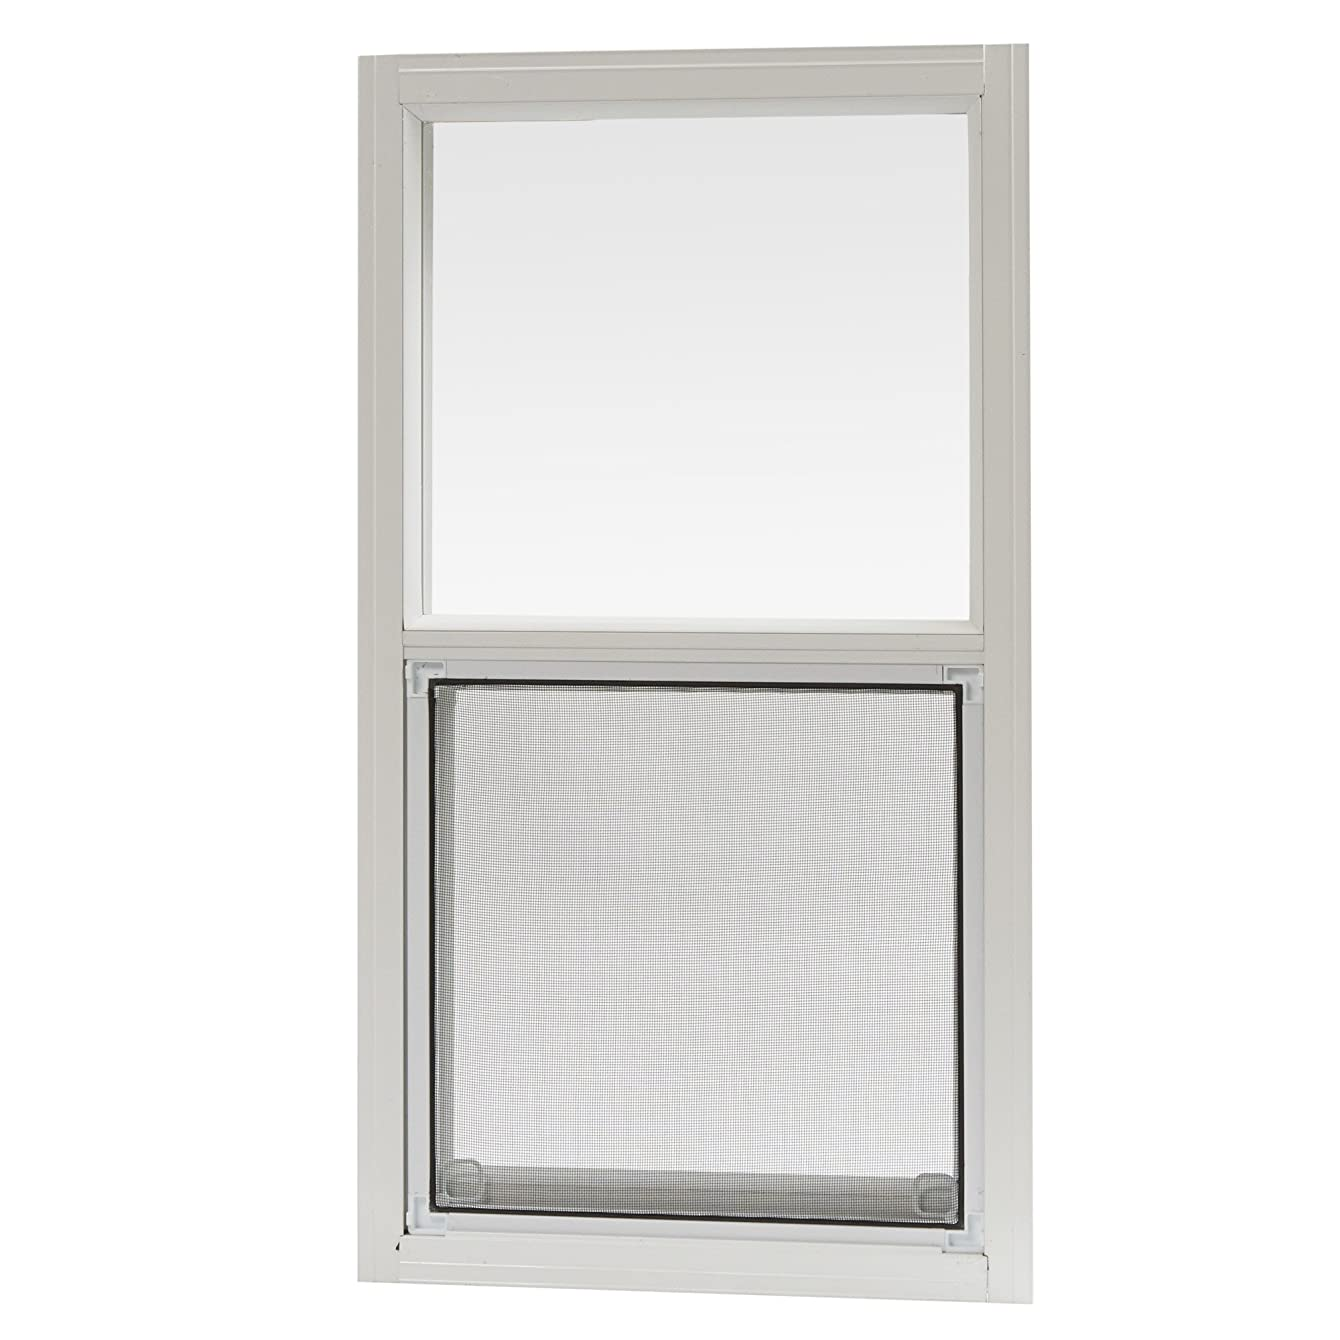 Park Ridge Products AMHW1427PR Park Ridge 14 in. x 27 in. Aluminum Mobile Home Single Hung Window – White,